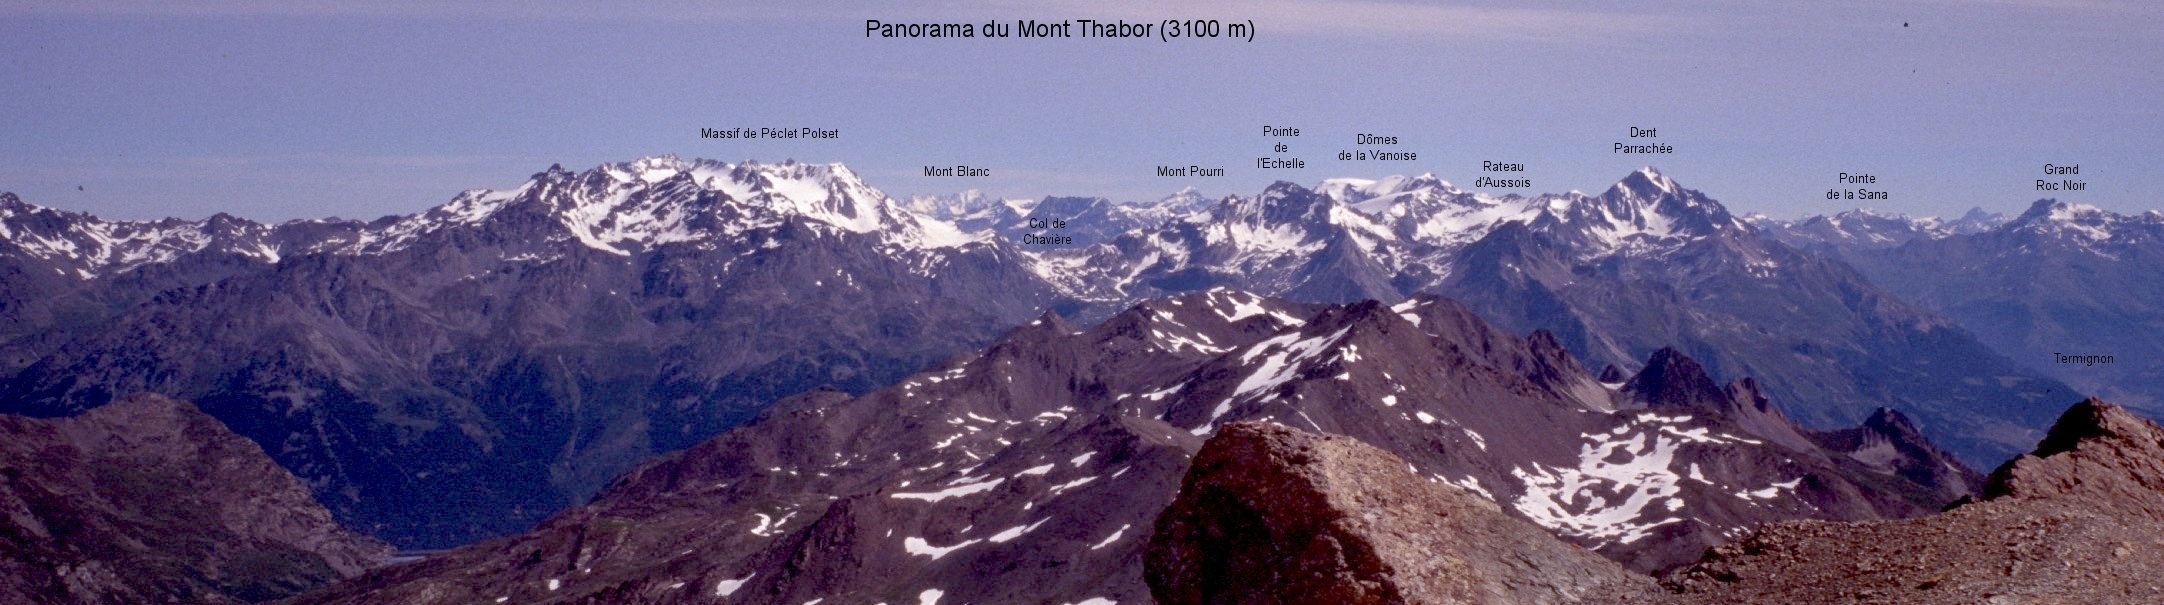 http://www.lesia.obspm.fr/perso/jean-marie-malherbe/panoramas/Legendes/Thabor2-legendes.jpg